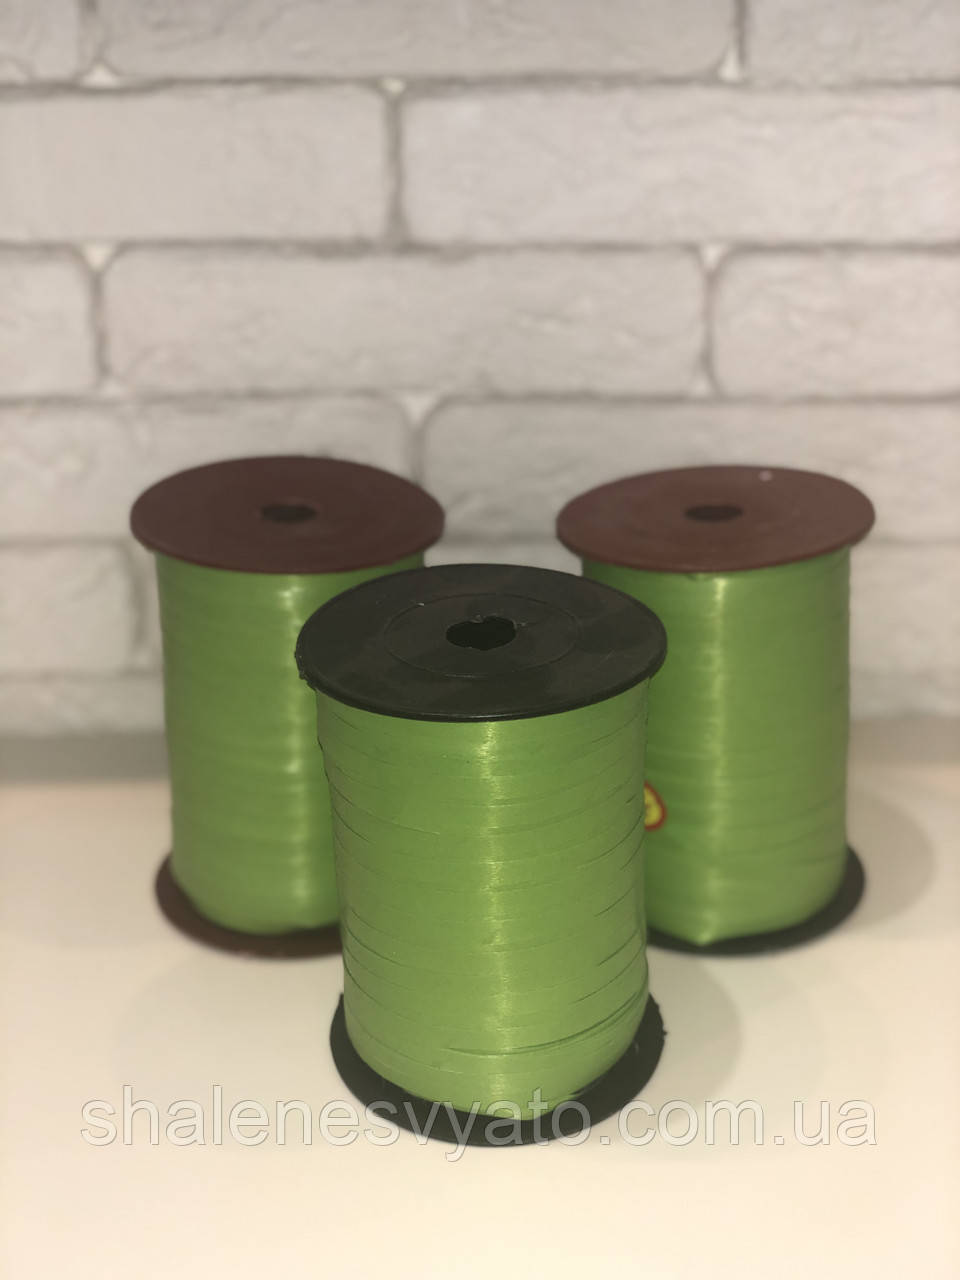 Лента для шаров зелёная 0,5/400 Украина